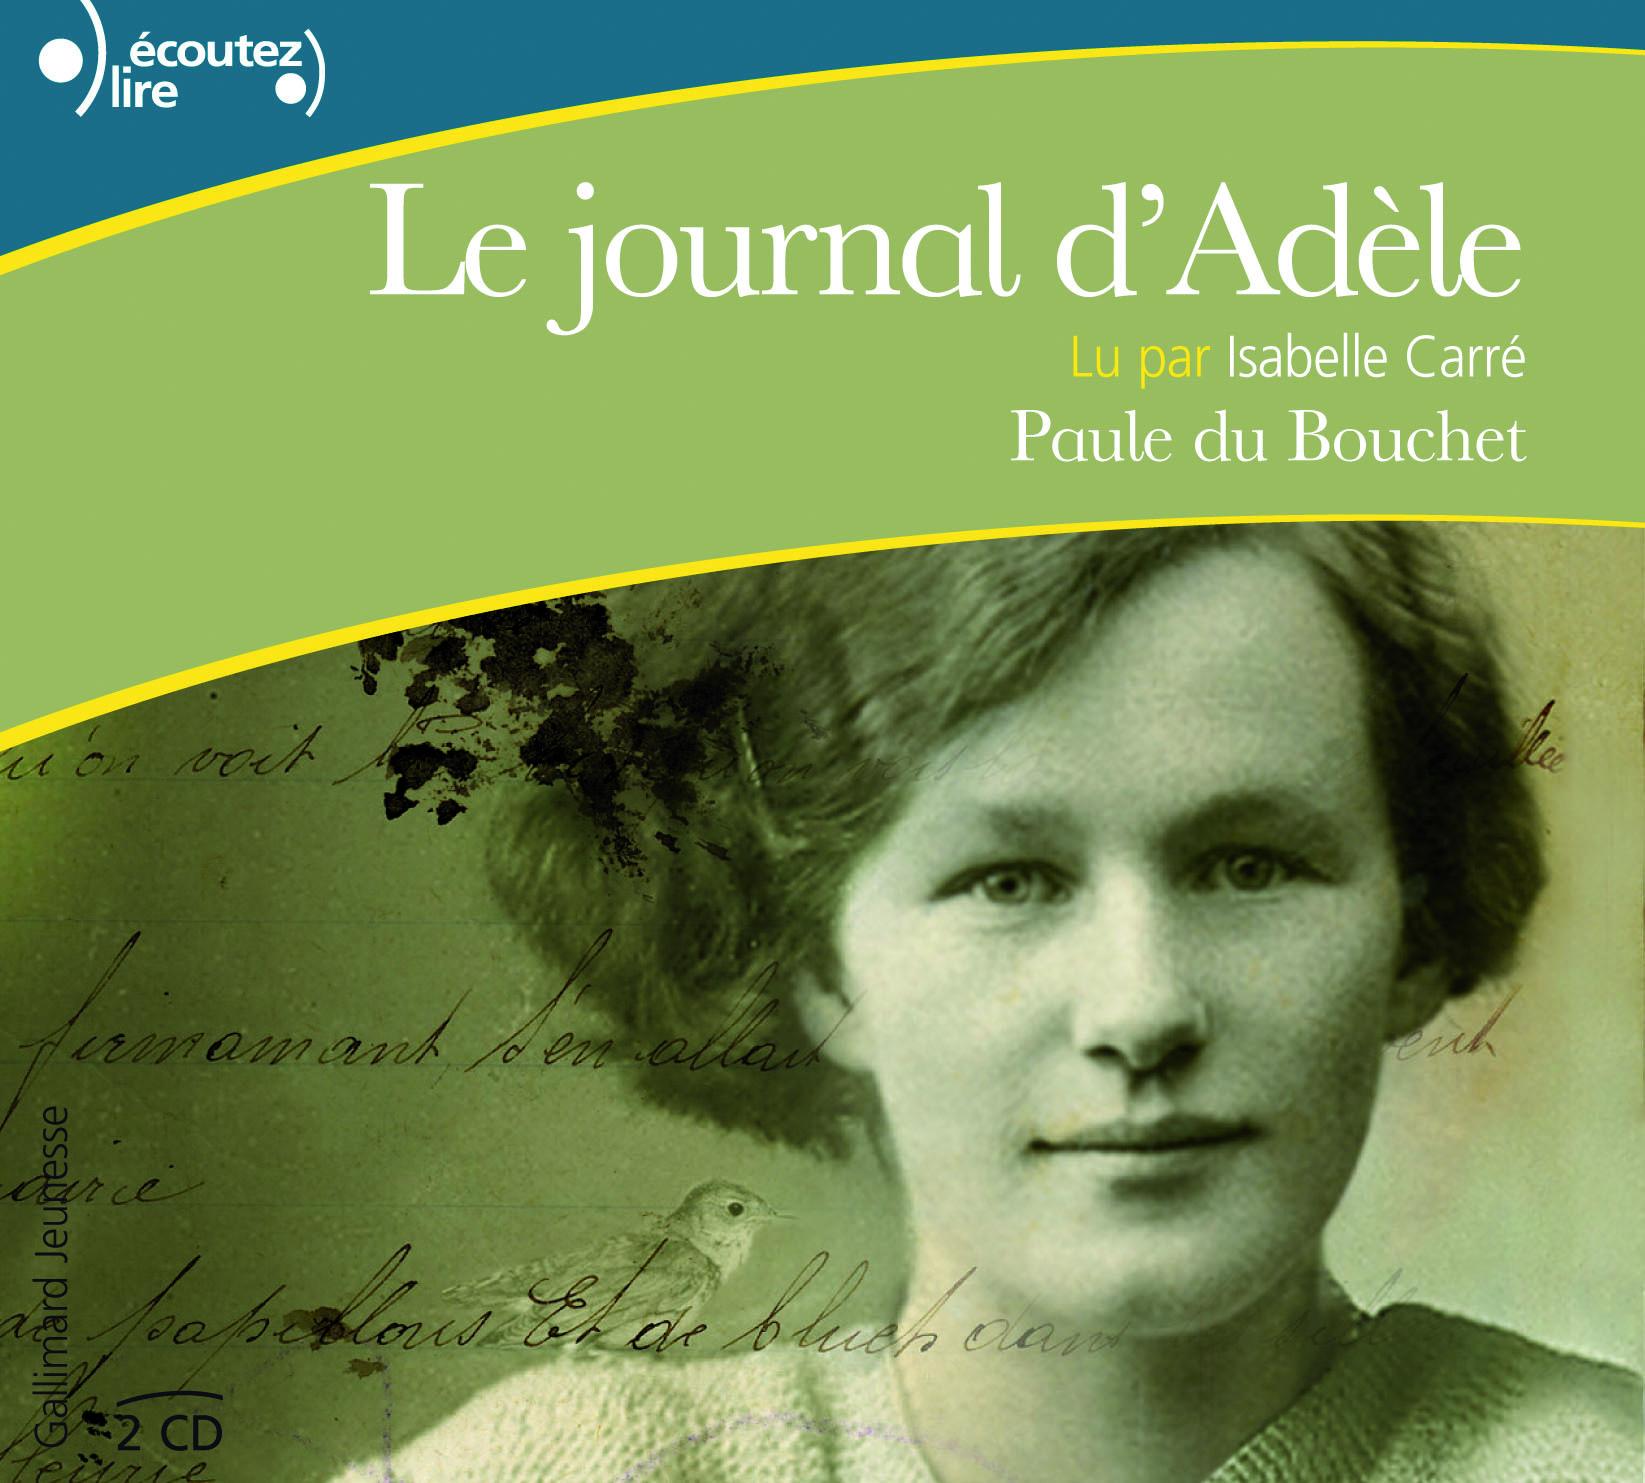 LE JOURNAL D'ADELE